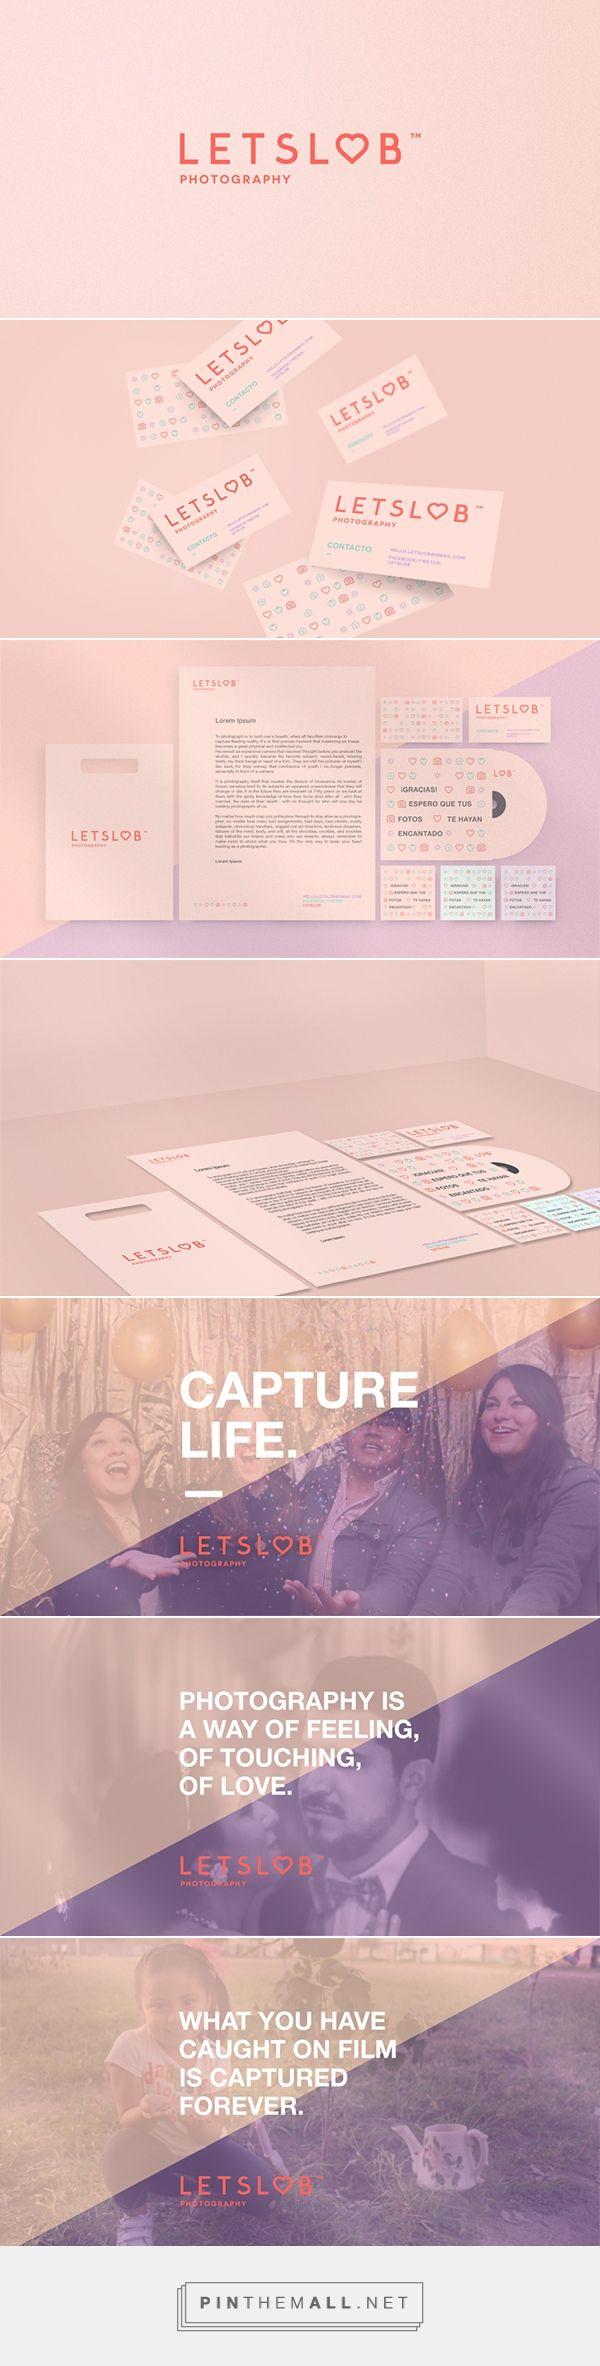 L E T S L O B Photography Branding by Raquel Gonzalez | Fivestar Branding – Design and Branding Agency & Inspiration Gallery | #BrandingInspiration